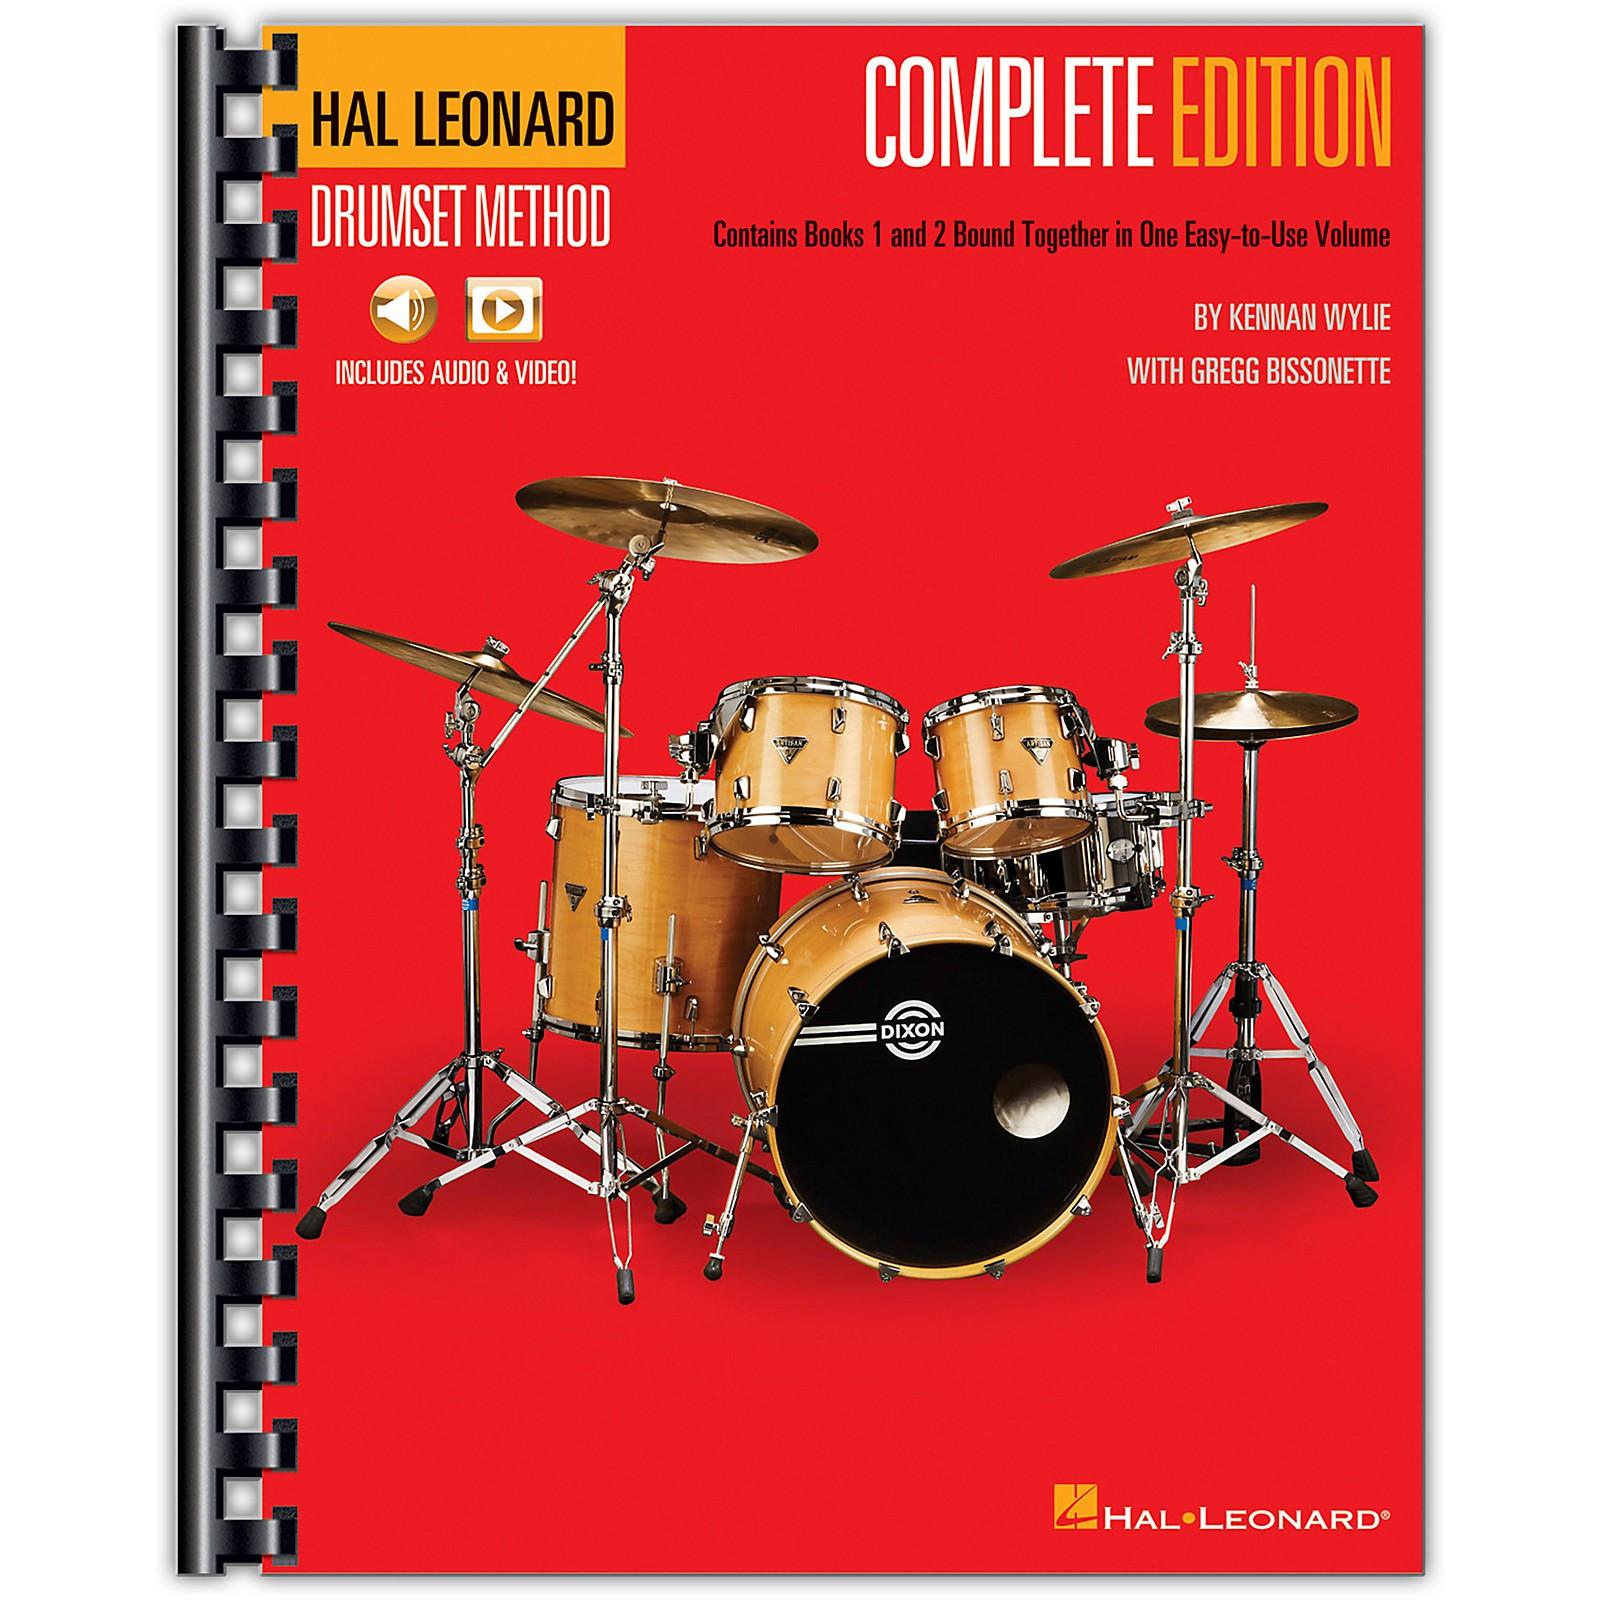 Hal Leonard Hal Leonard Drumset Method - Complete Edition Books 1 & 2 with Video and Audio